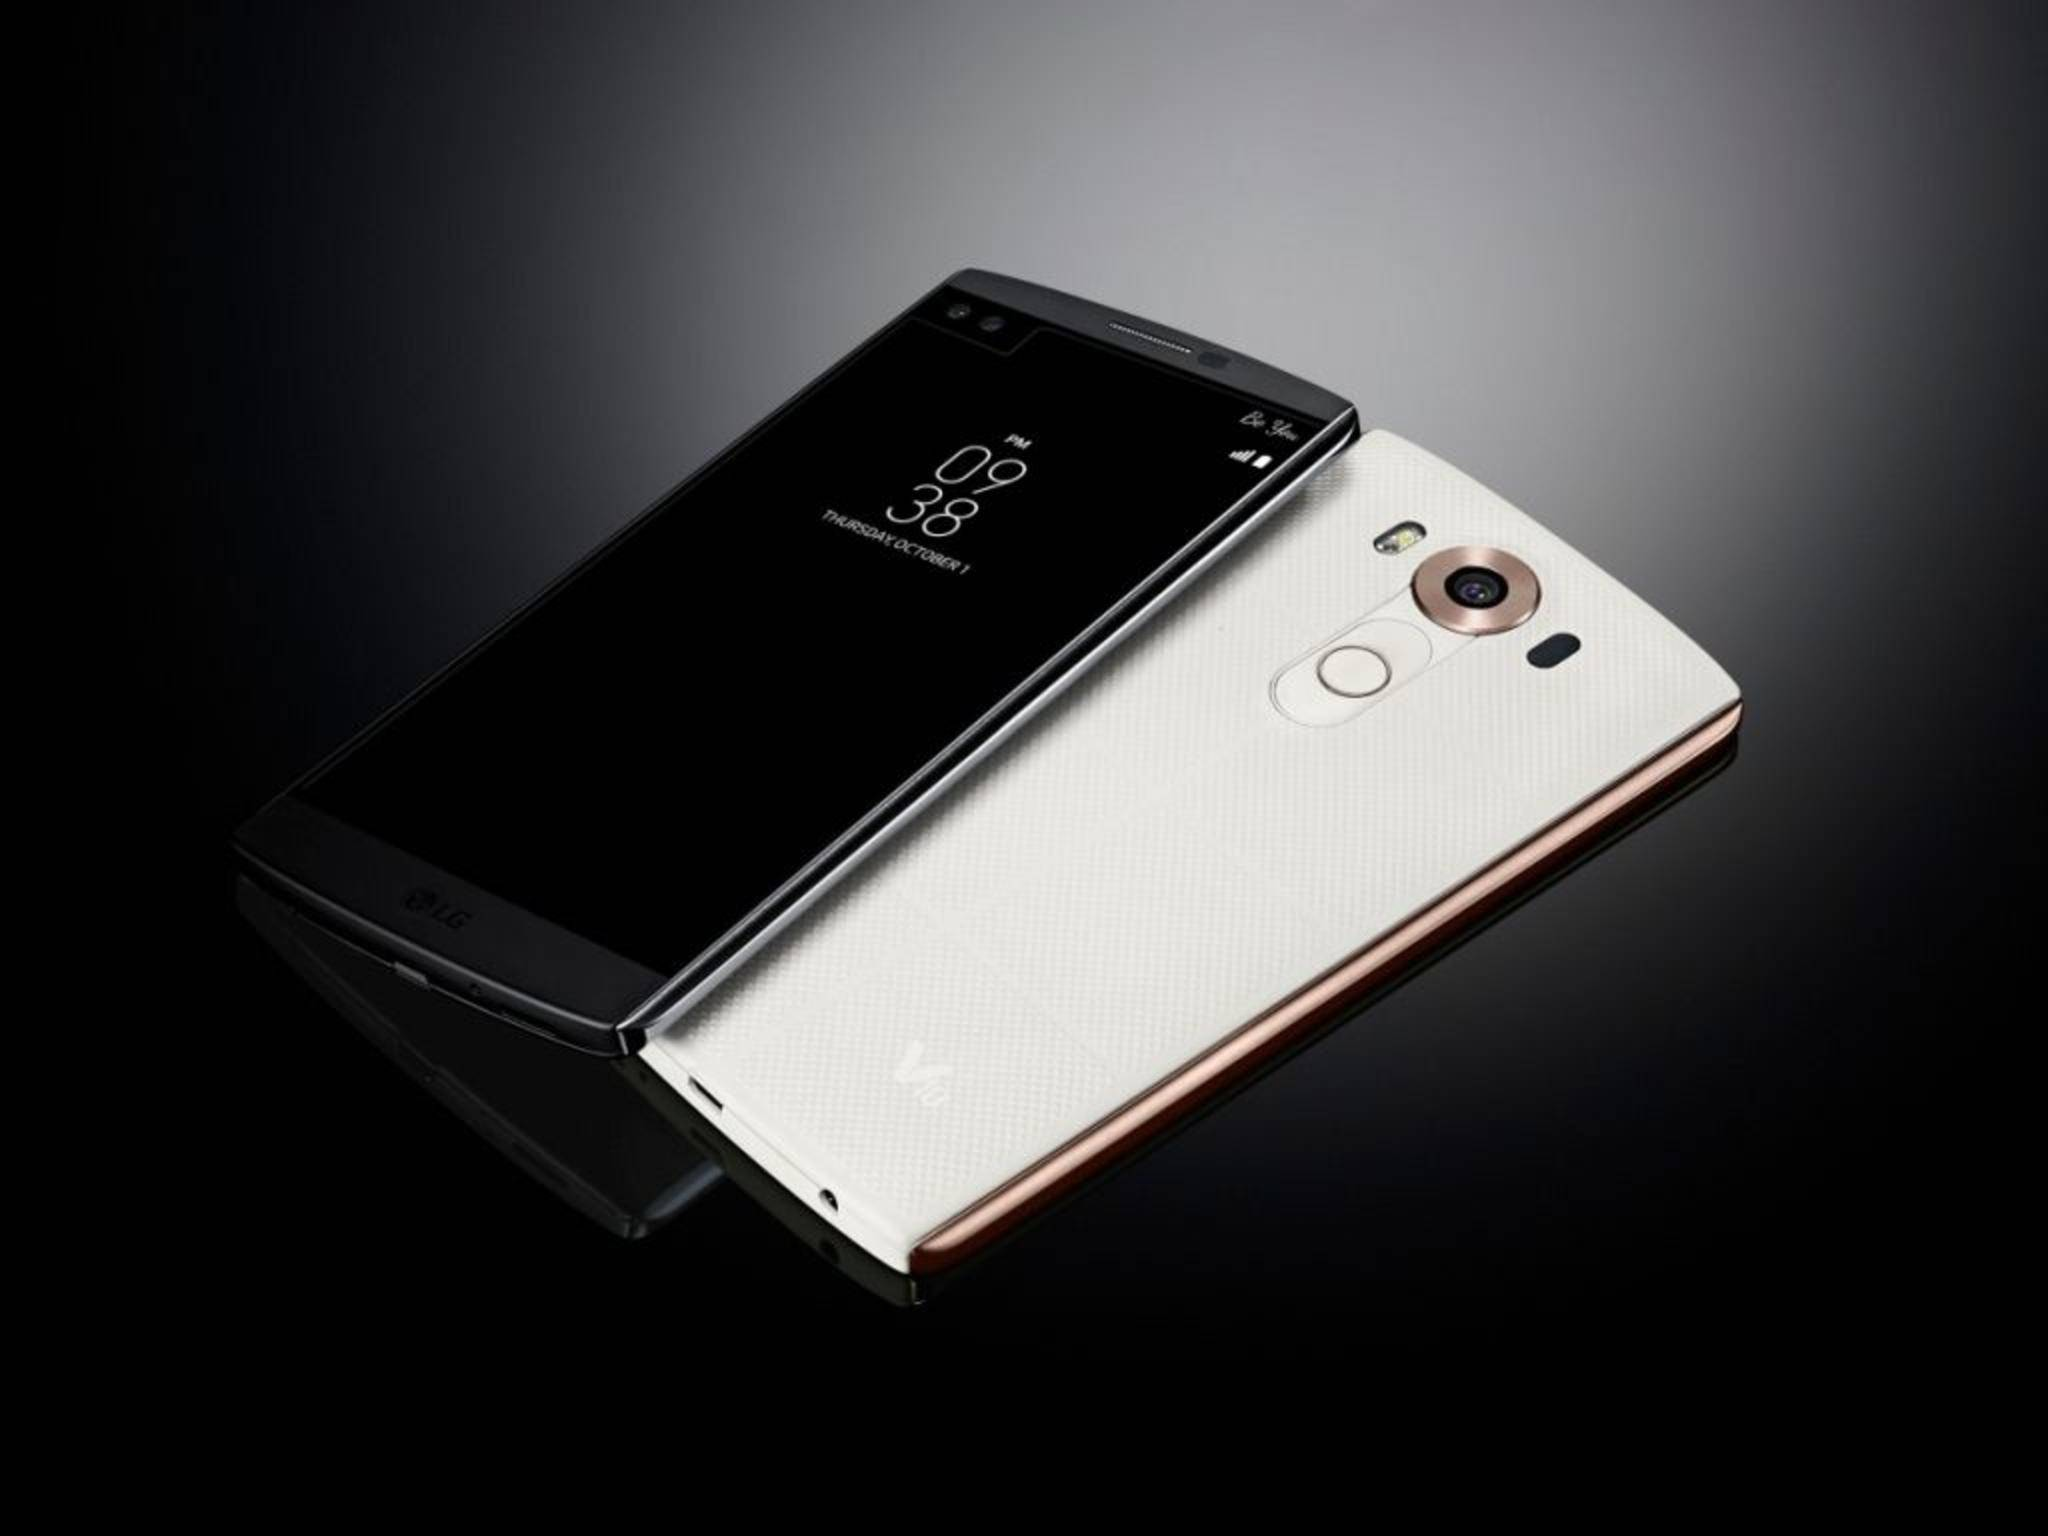 Das LG V10 bekommt mit dem V20 bald einen Nachfolger.